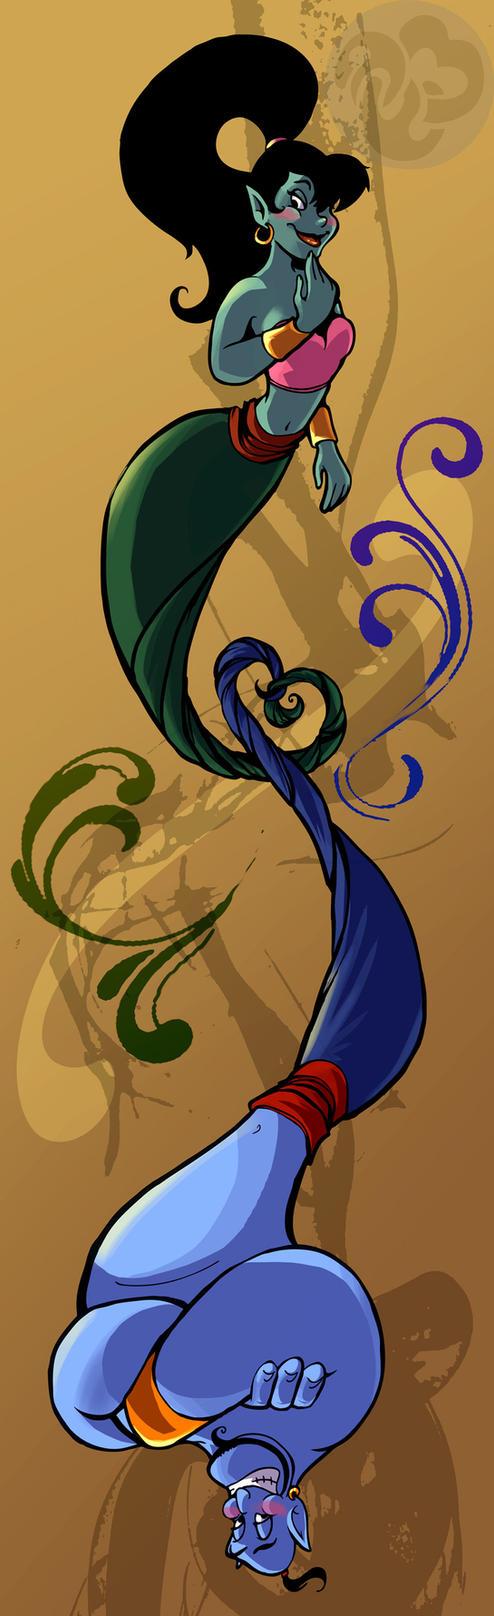 Aladdin Genie And Eden By CaptainashletART